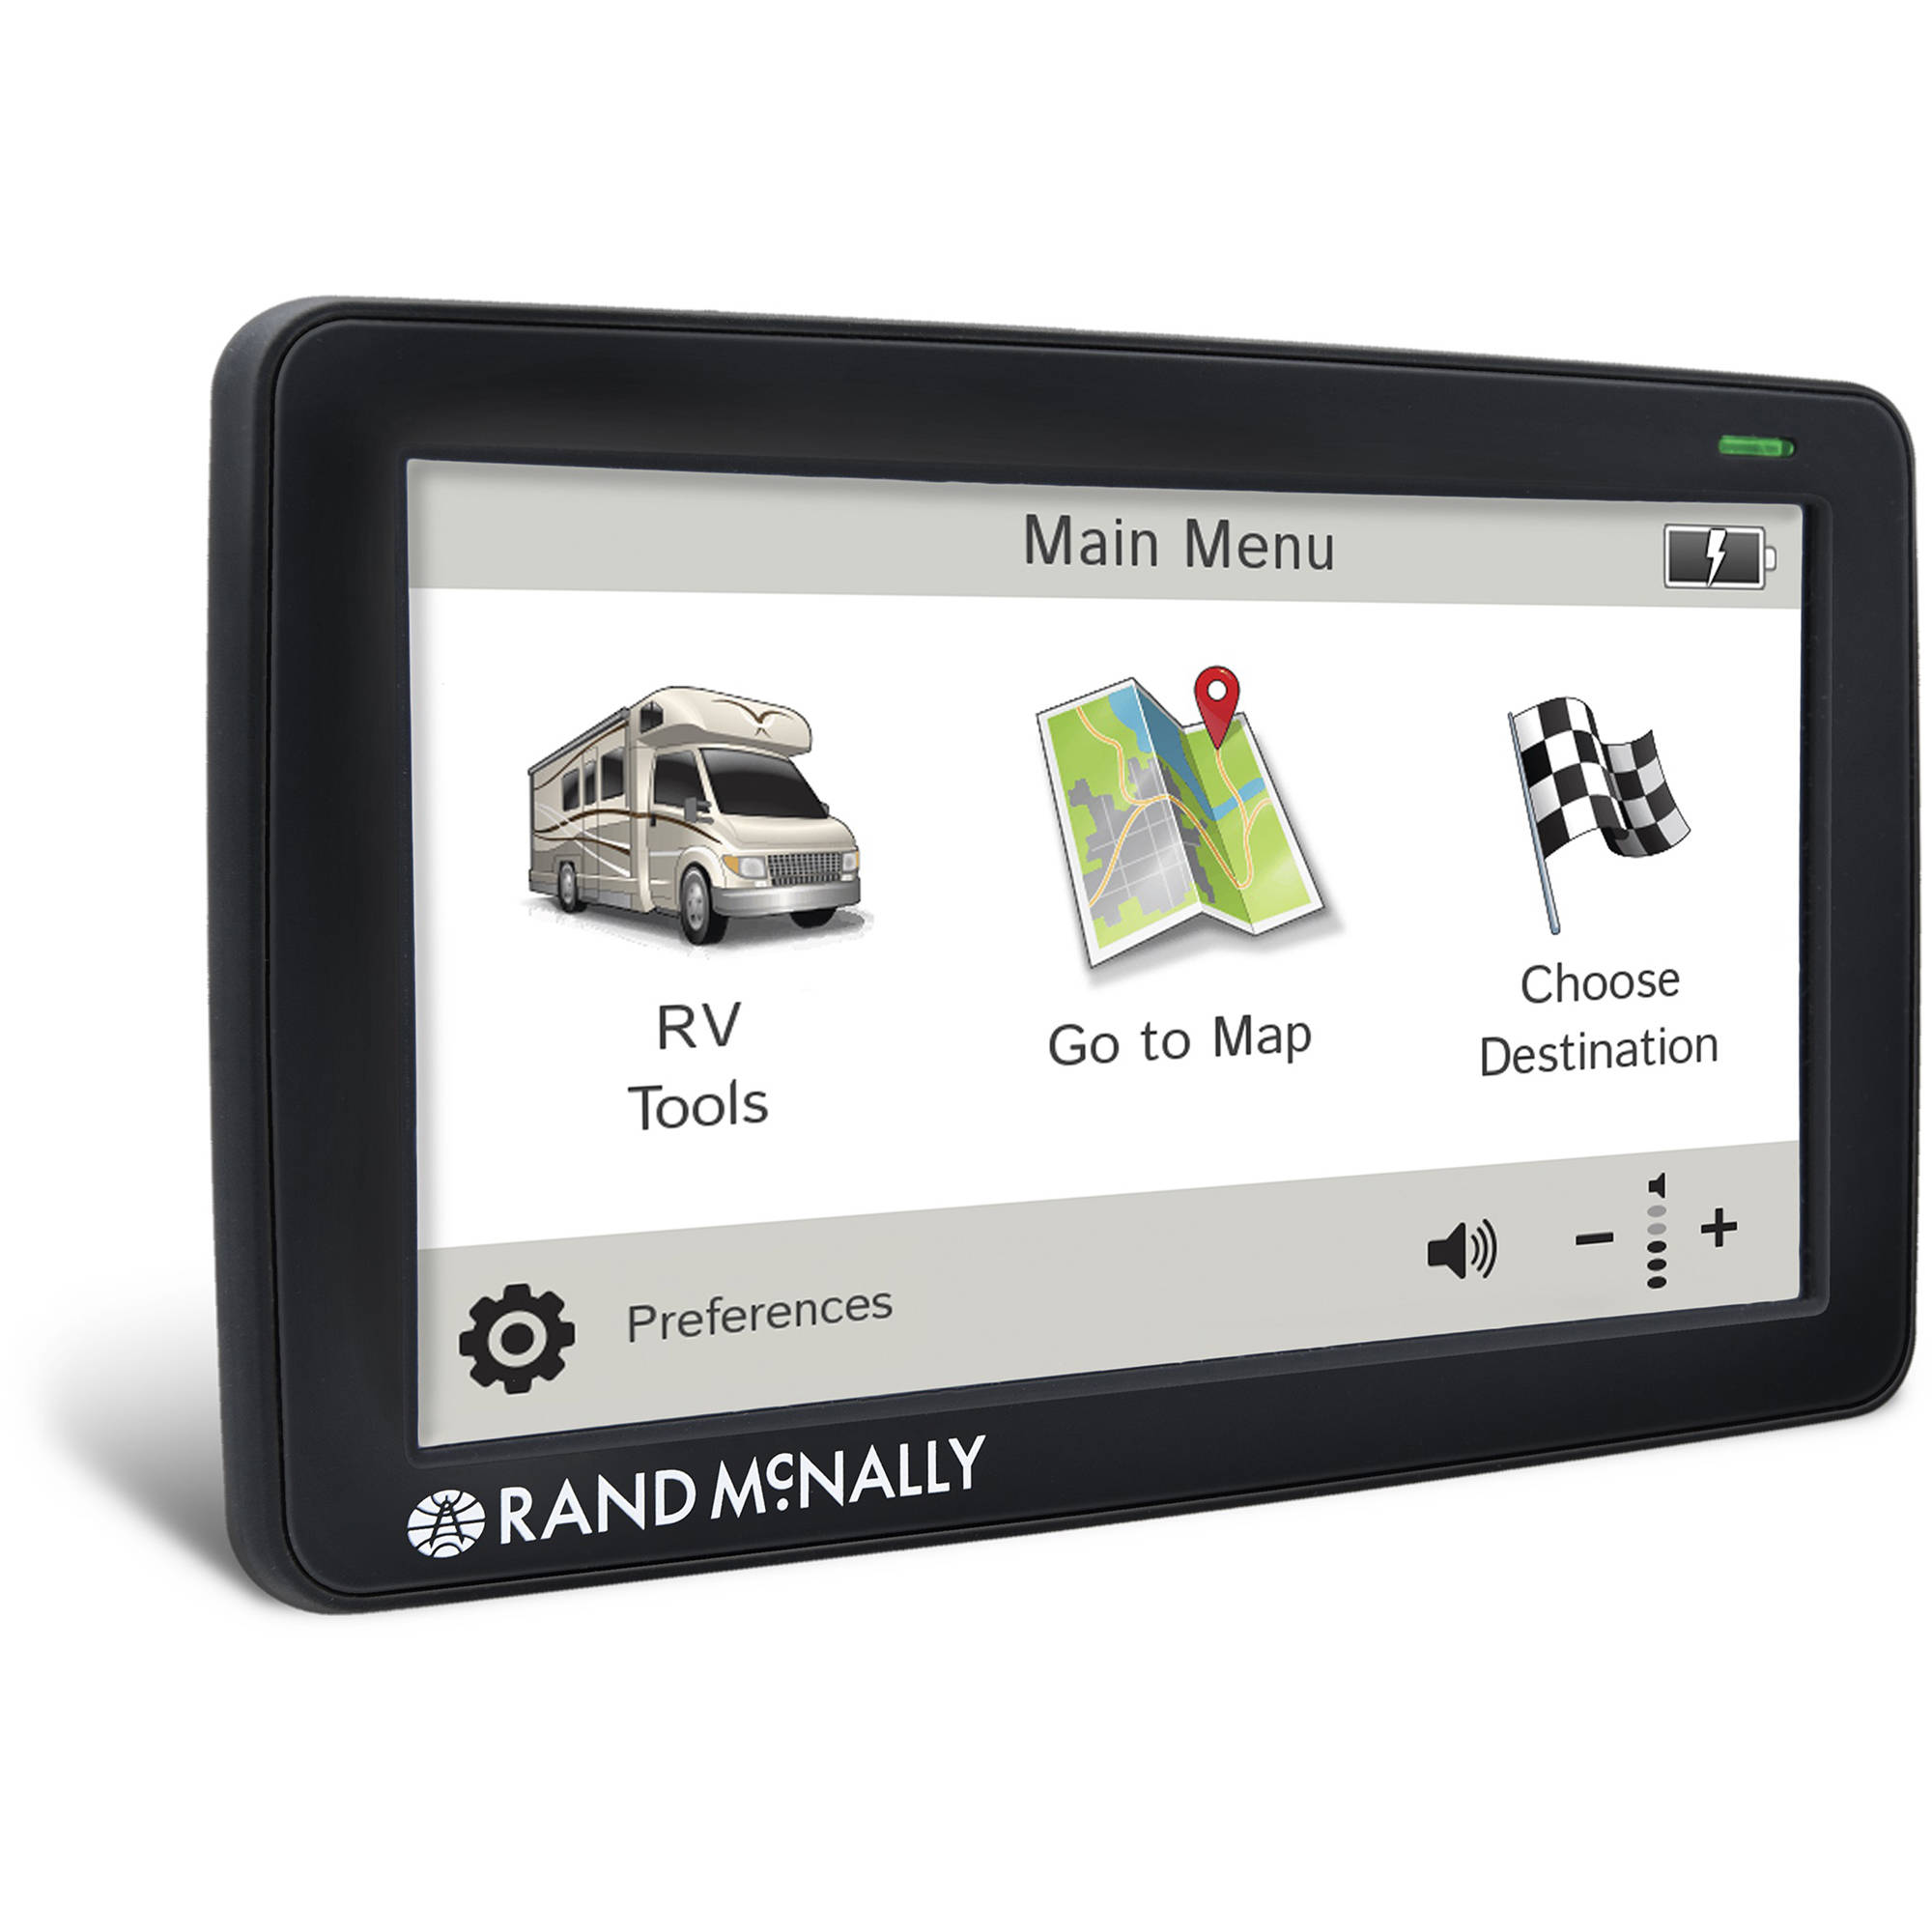 Rand Mcnally Gps >> Rand McNally RVND 7730 LM GPS Device 528012274 B&H Photo Video